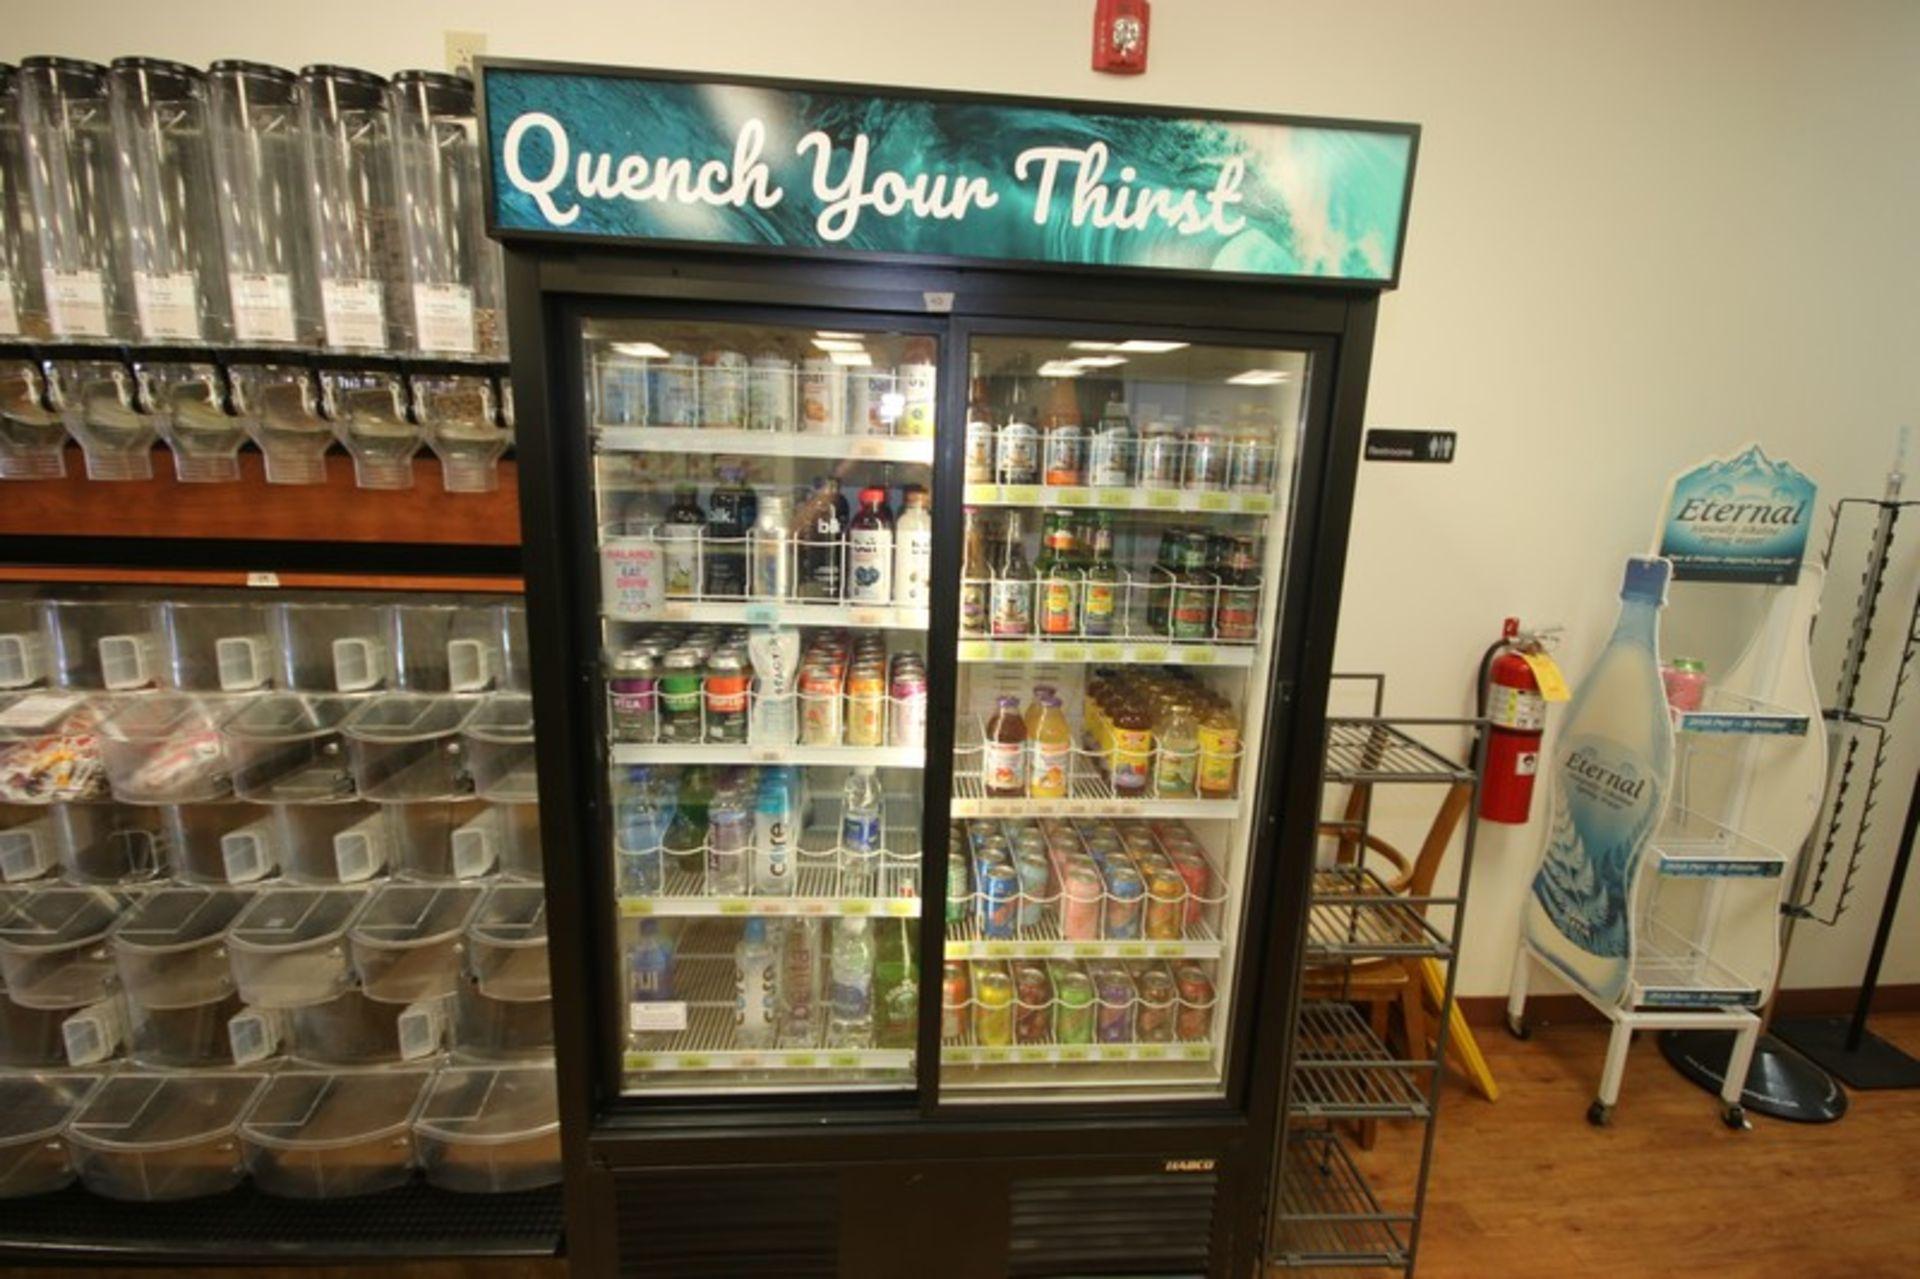 Habco Sliding Glass Refrigerator, M/N ESM42, S/N 420249330, 115 Volts, 1 Phase, Design Pressure: Low - Image 3 of 4